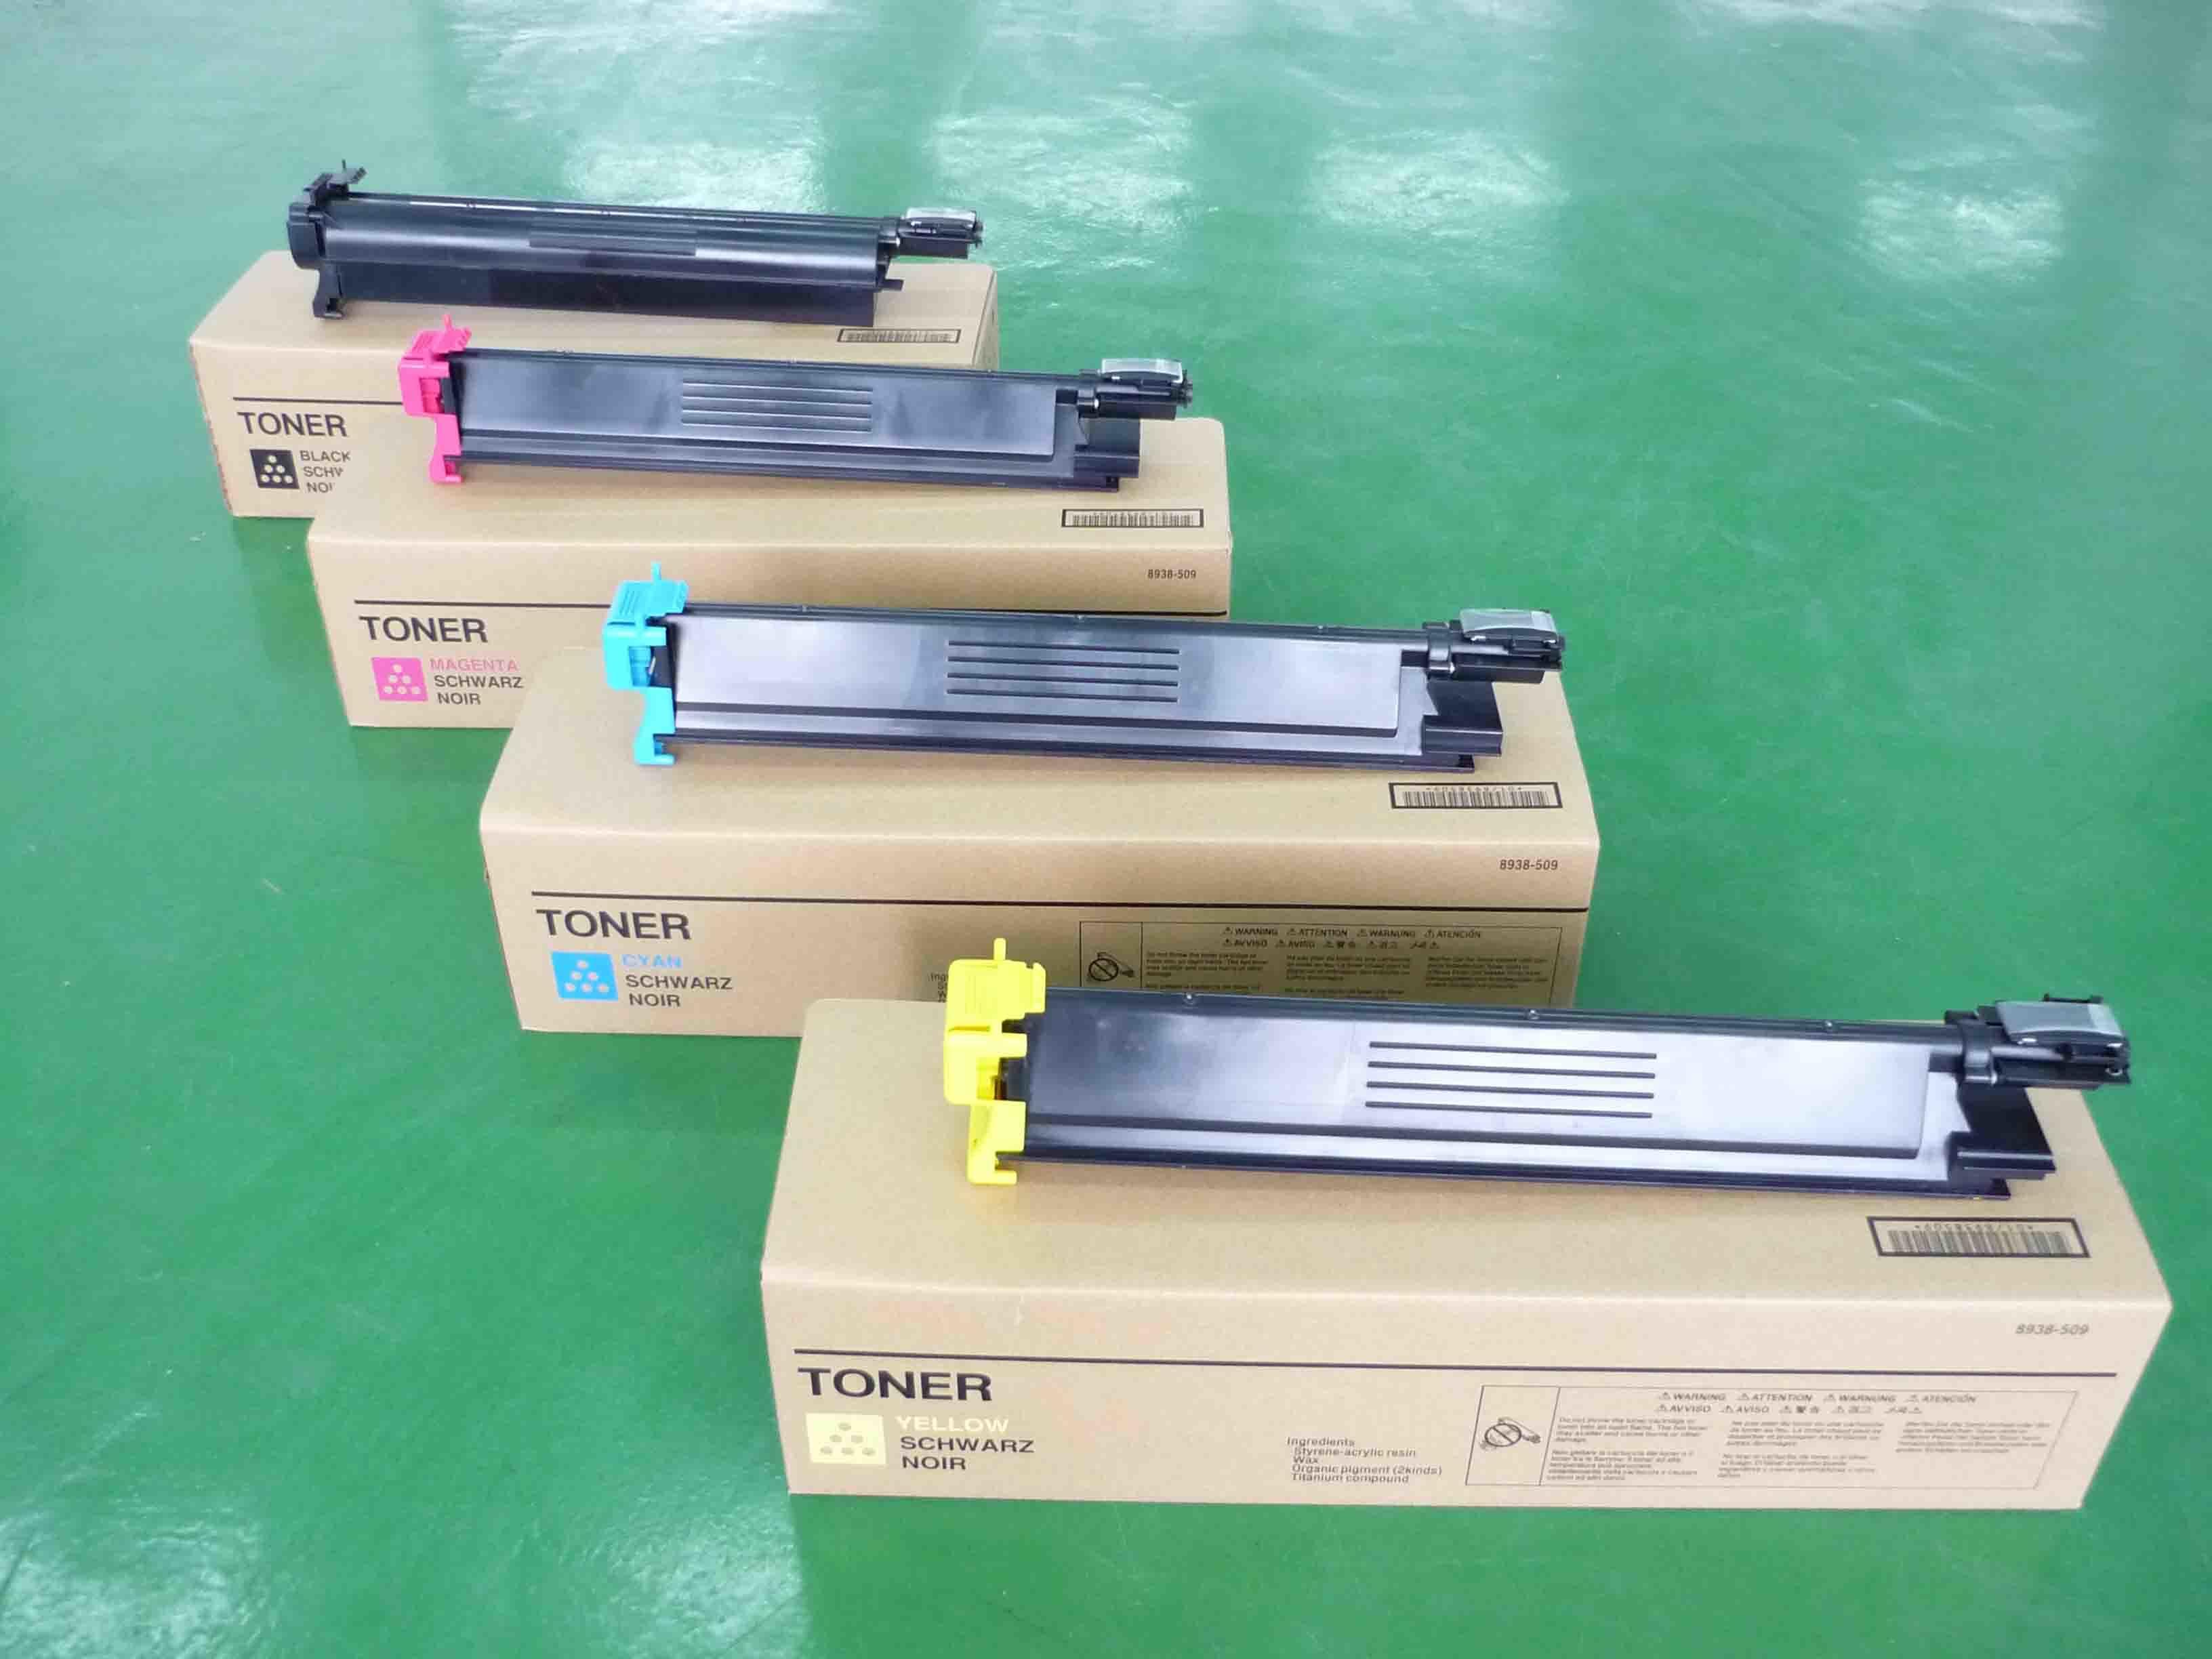 100g//Bottle,6 Black,6 Cyan,6 Magenta,6 Yellow No-name Refill Copier Color Toner Powder Kits for Konica Minolta Bizhub TN-216 TN216 TN 216 C220 C280 C 220 280 Laser Printer Toner Power